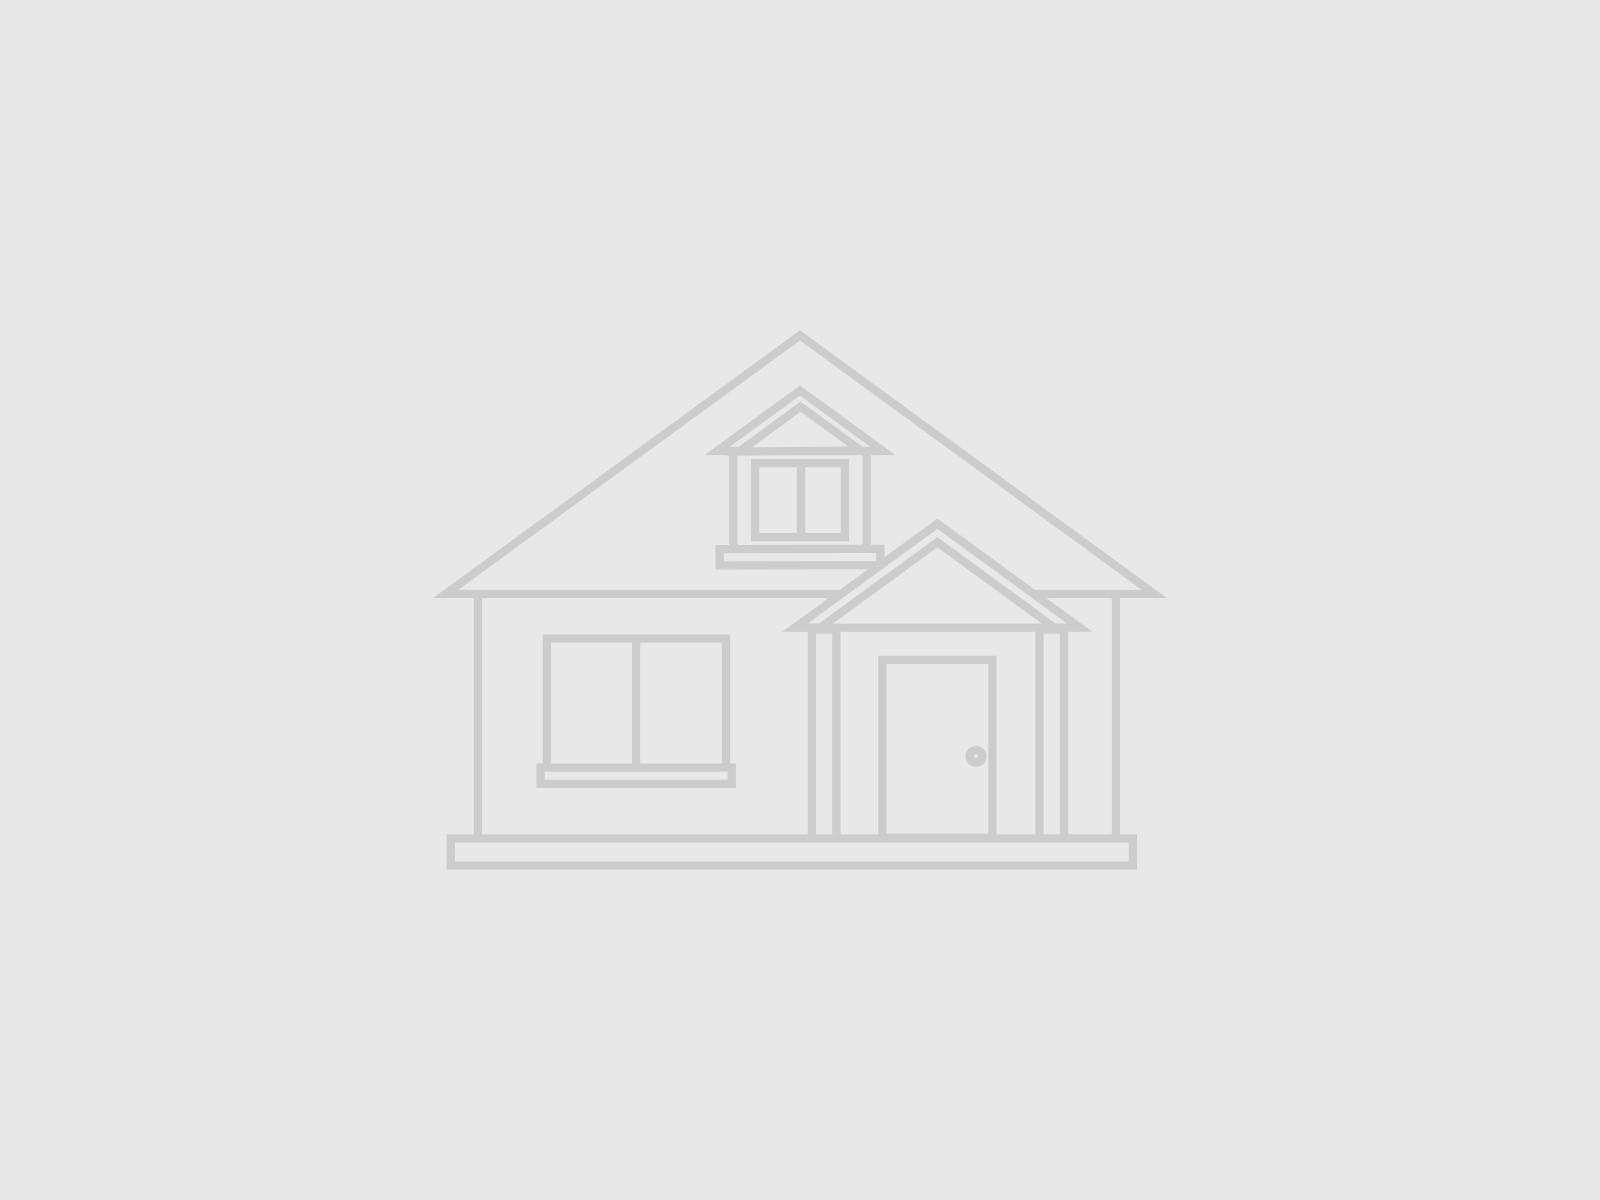 3321 diamond key ct a luxury single family home for sale in burnt store marina punta gorda, florida property id c7420929 christie s international real estate